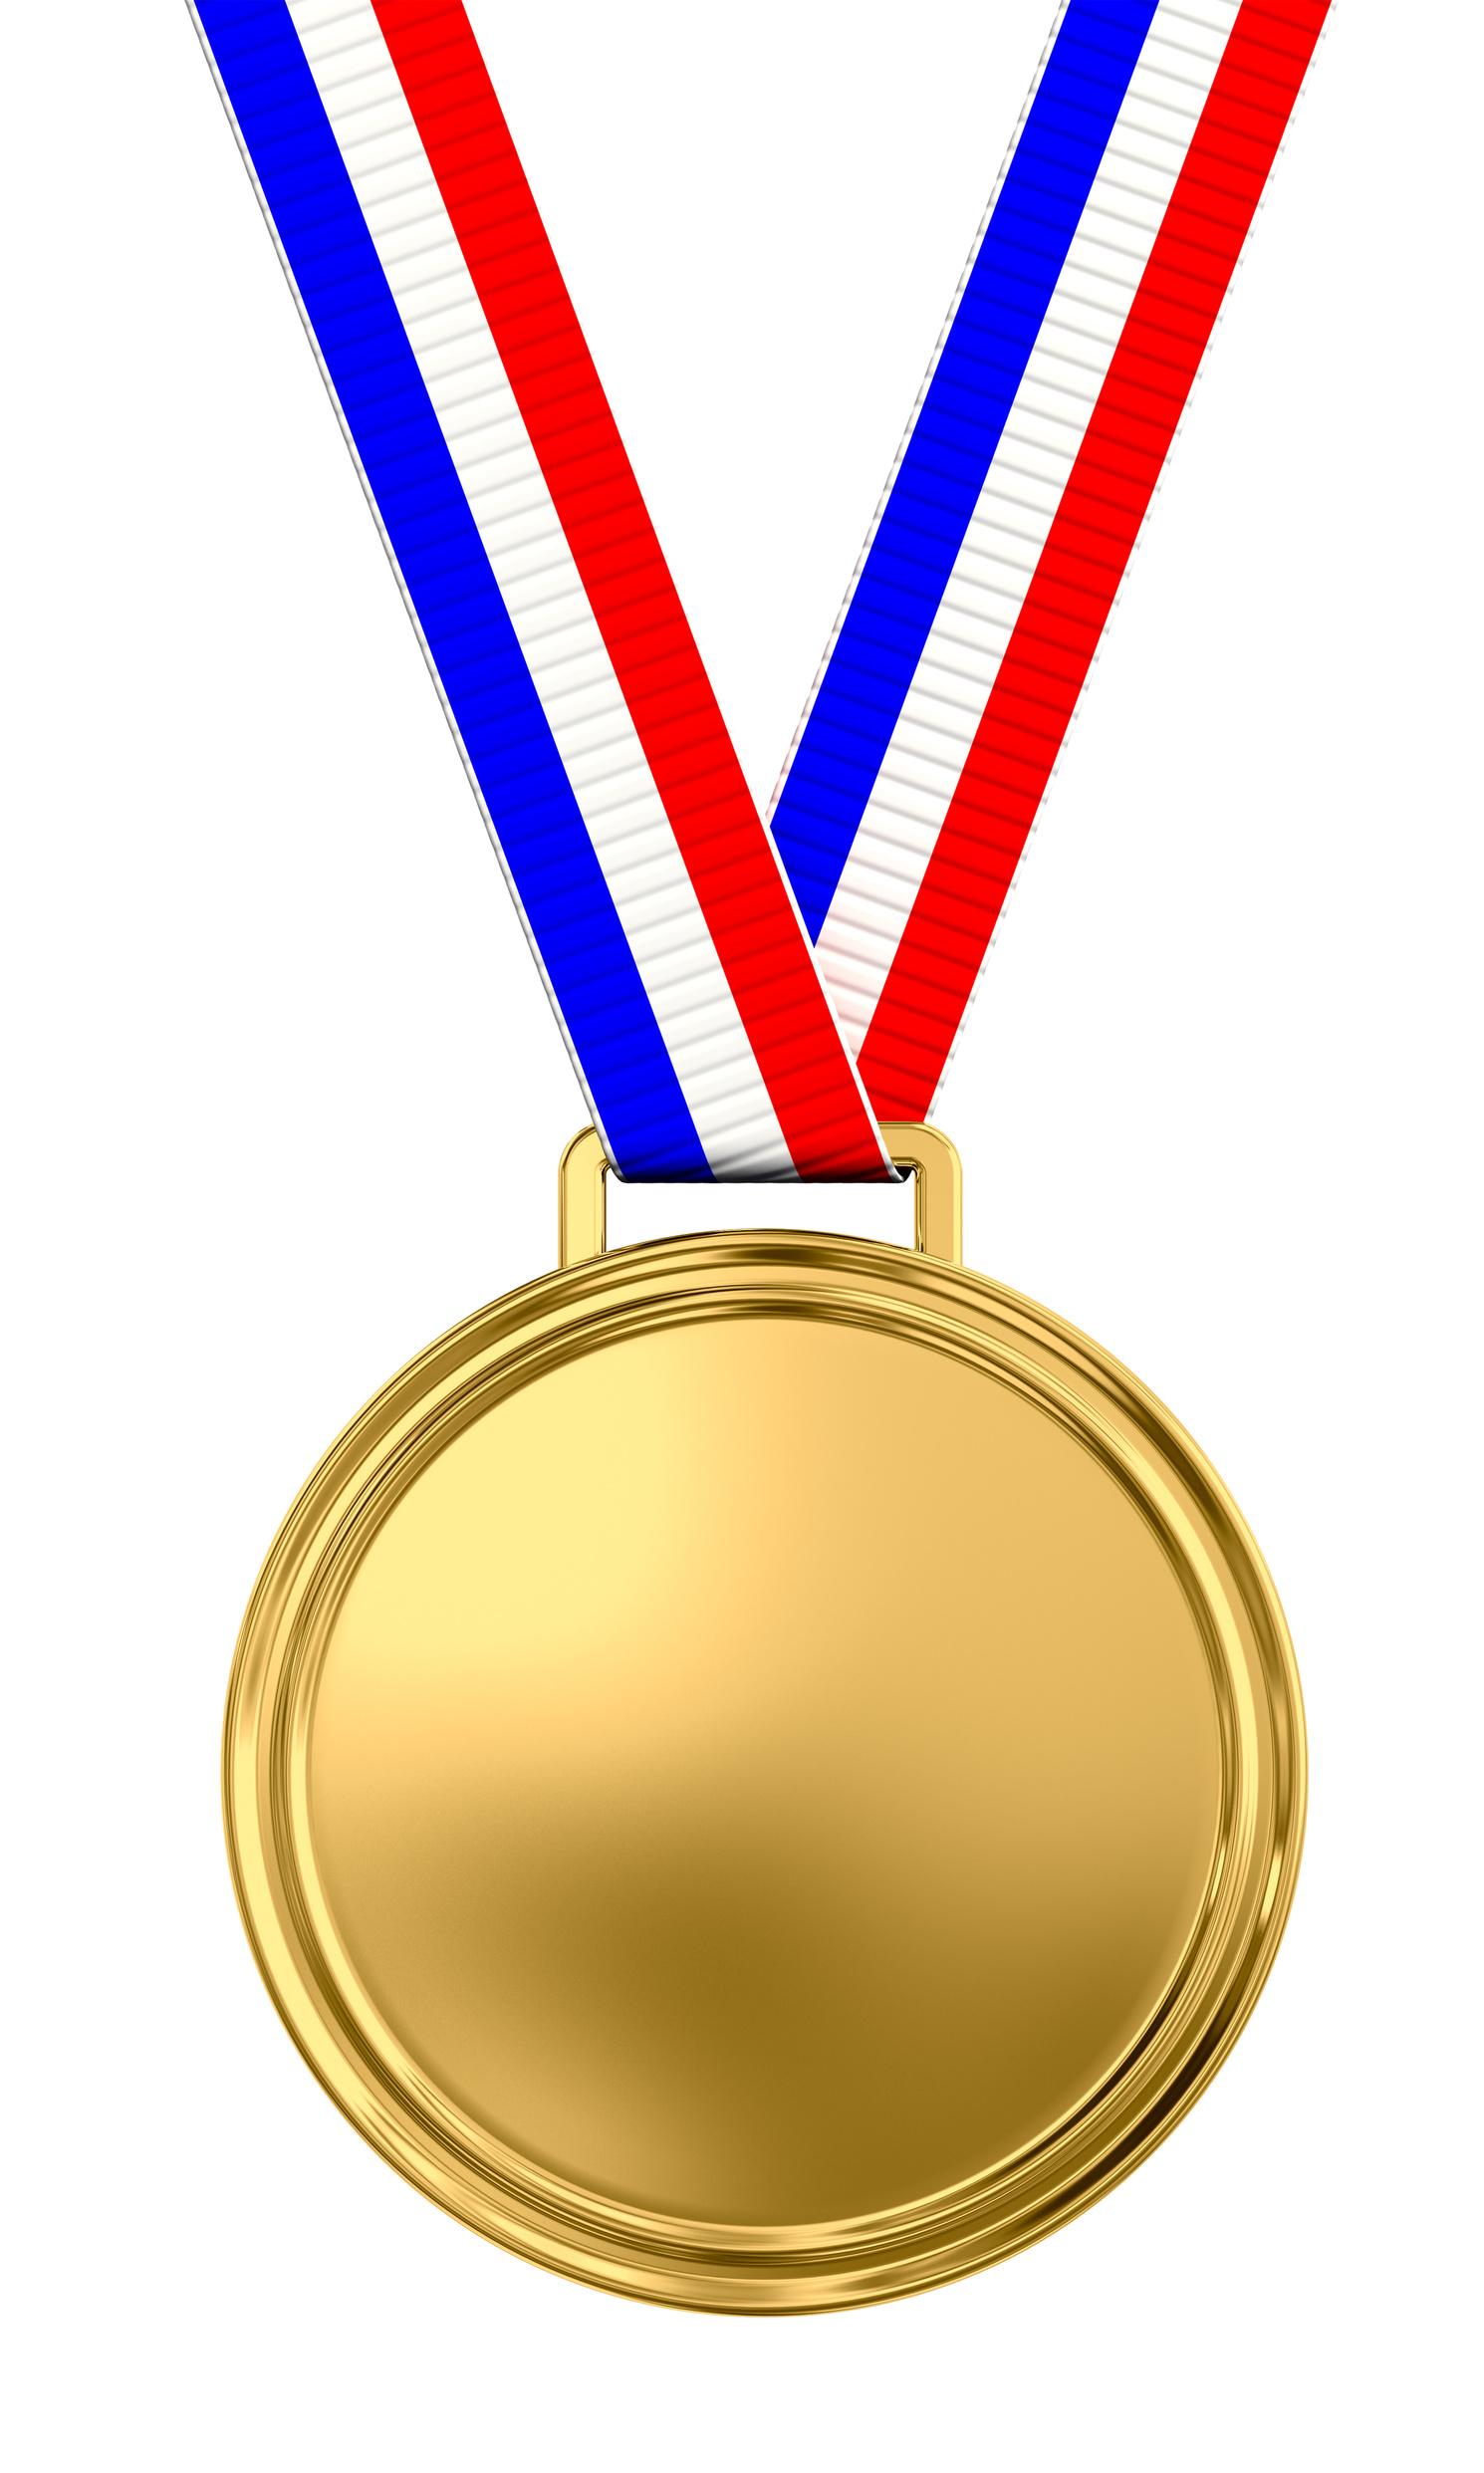 Award clipart medal. Gold timmins ringette association